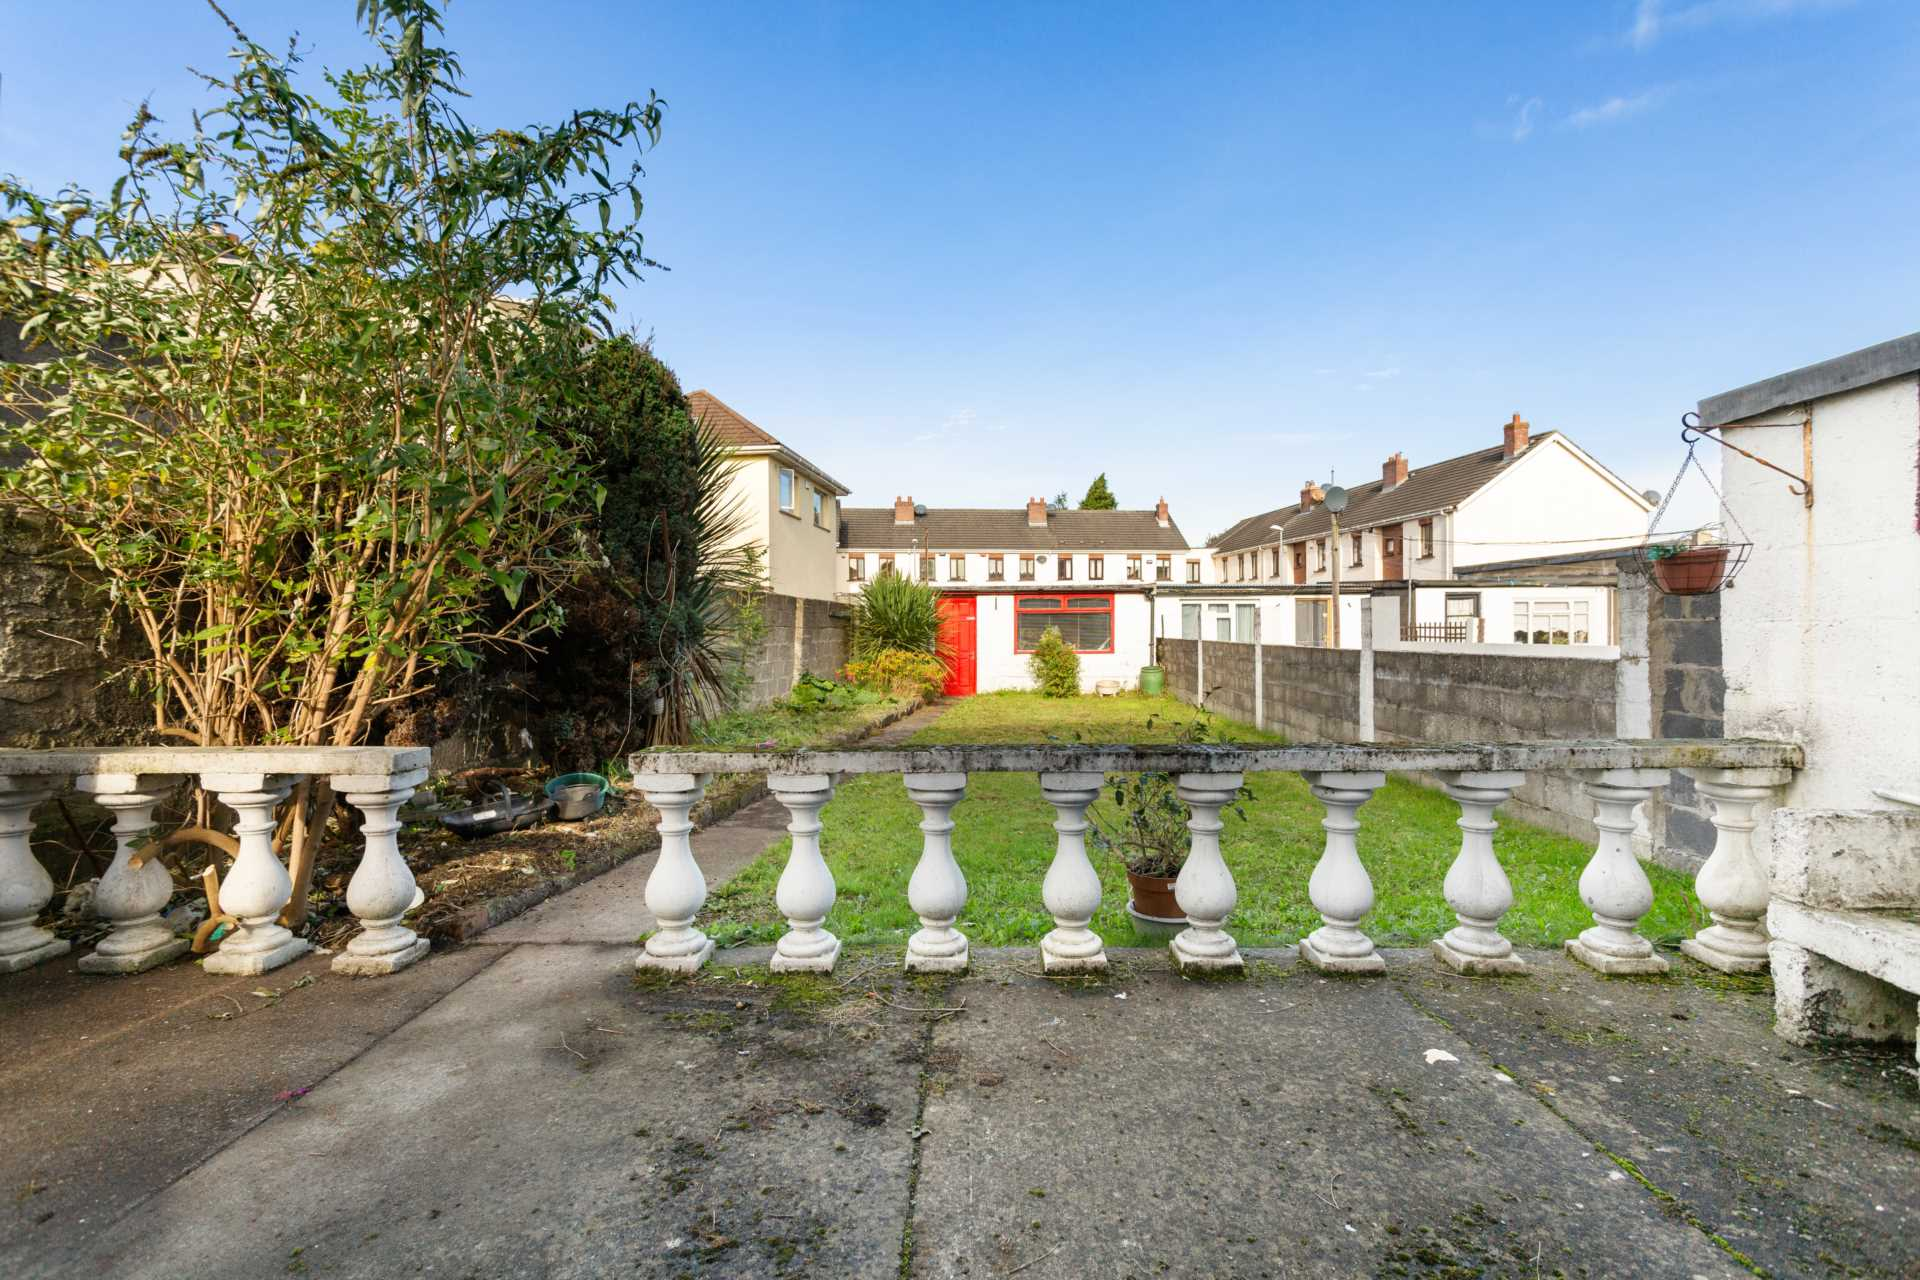 41 Bunting Road, Walkinstown, Dublin 12, Image 10